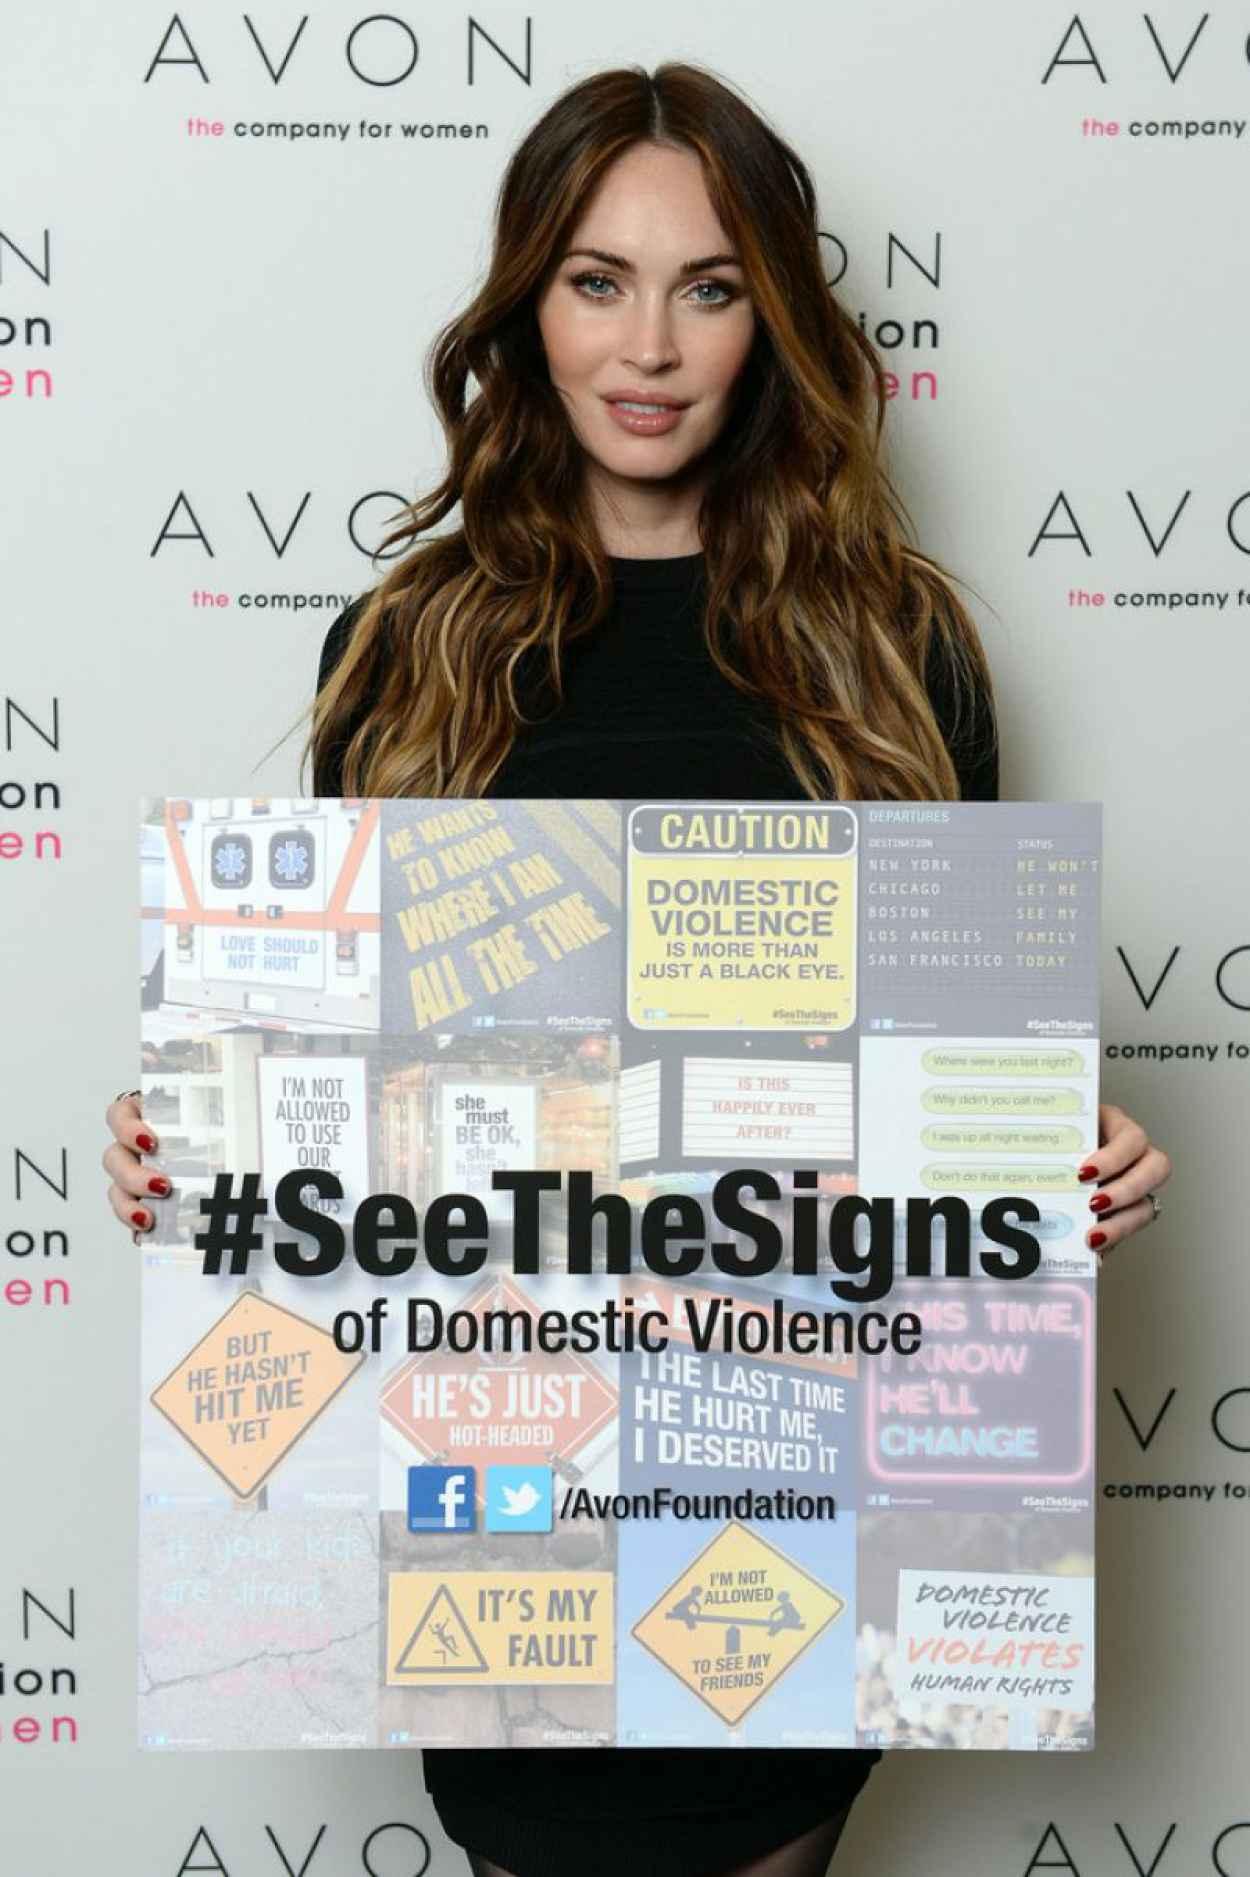 Megan Fox - Launches the Avon Foundation - November 2015-1